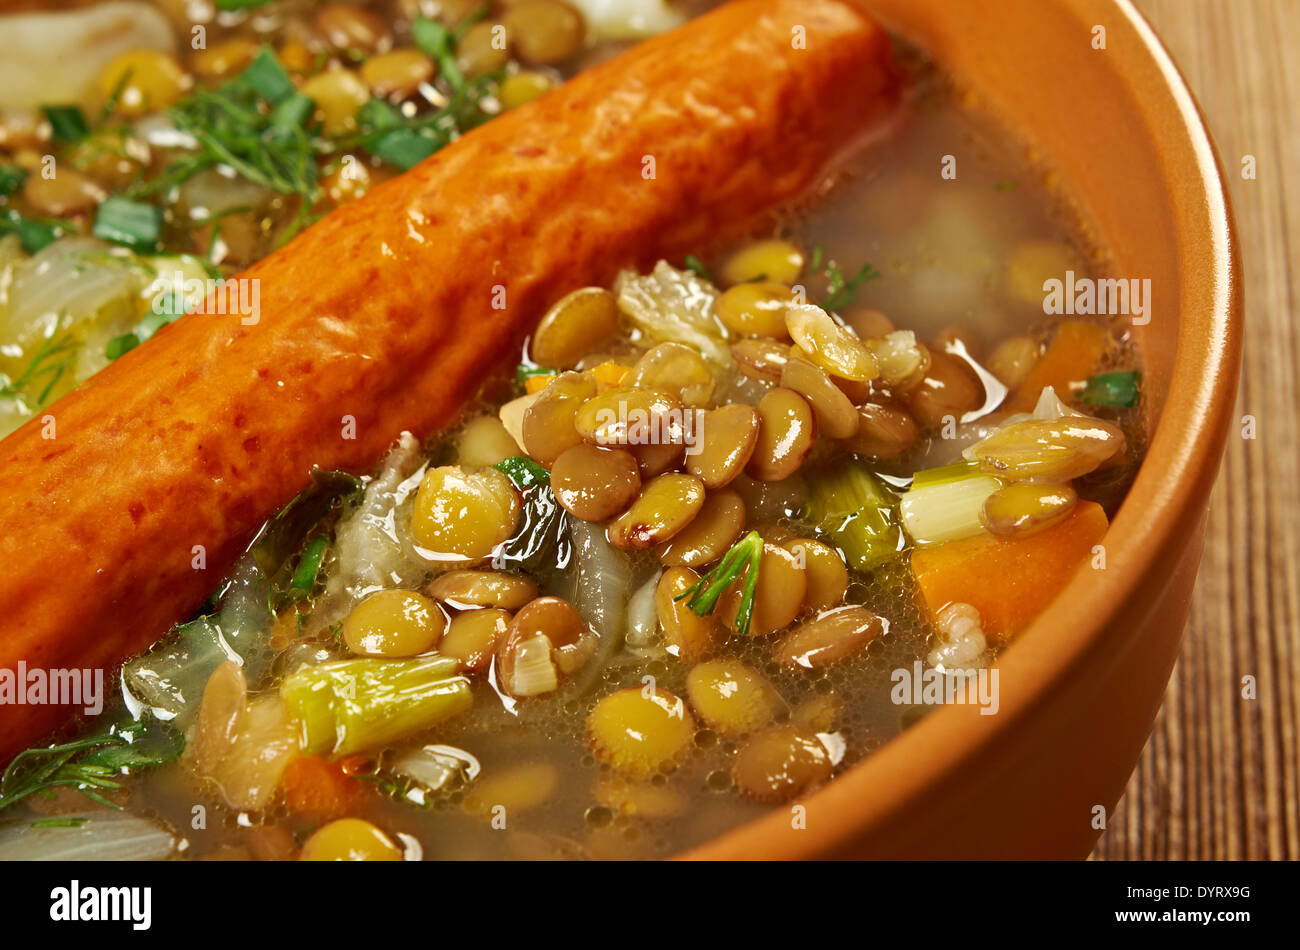 Frankfurter Linsensuppe -German Lentil Soup with sausage.farmhouse kitchen Stock Photo